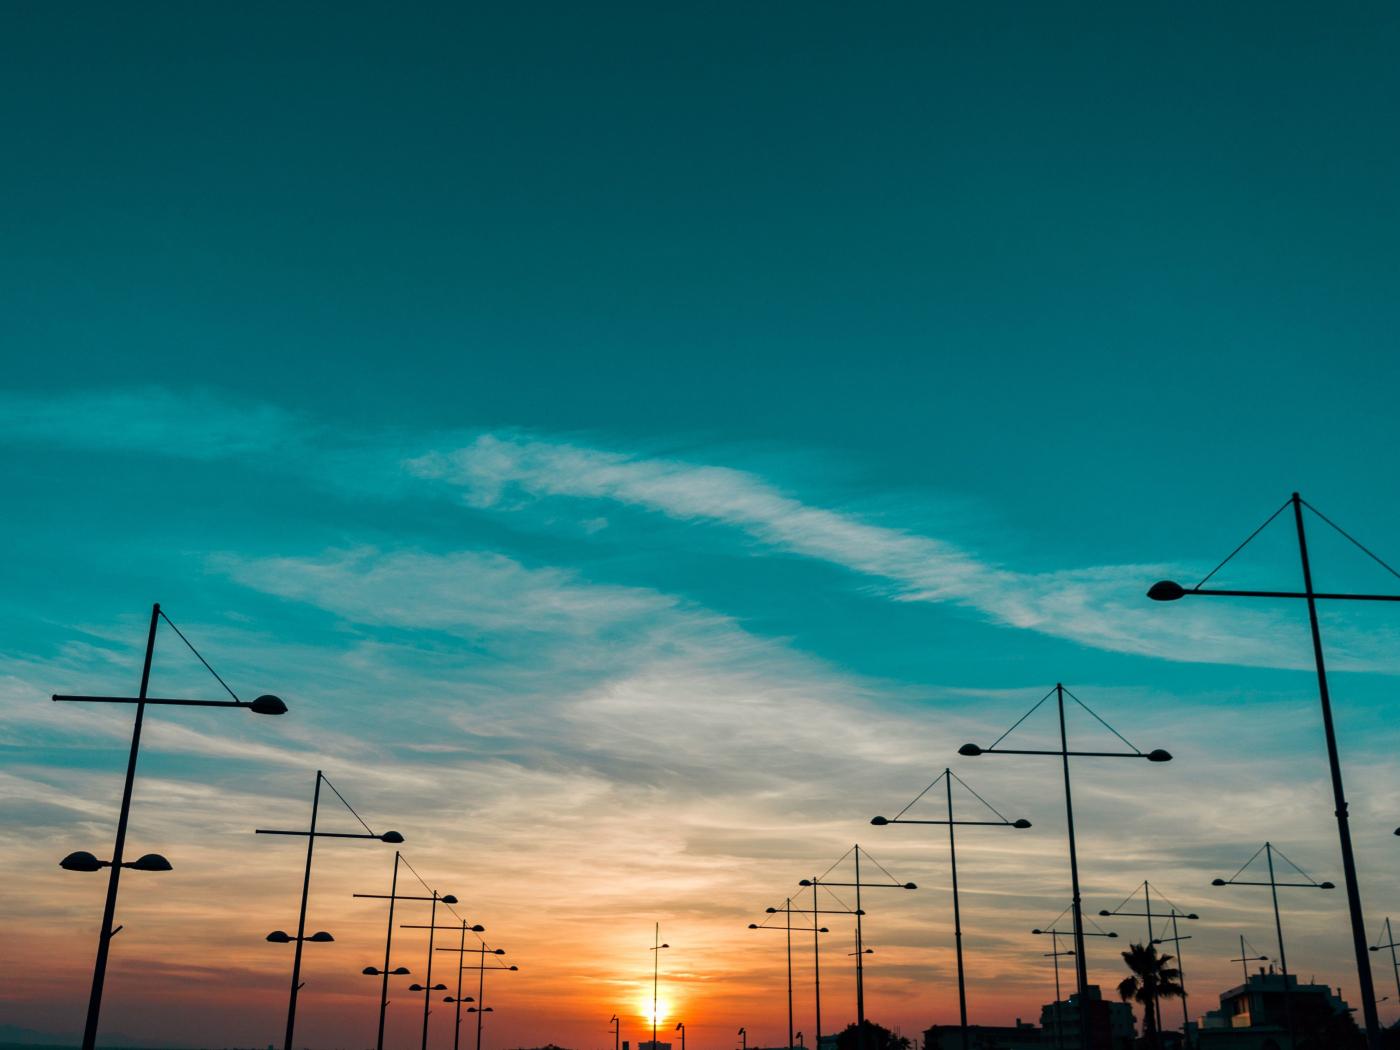 Sunset, landscape, skyline, 1400x1050 wallpaper